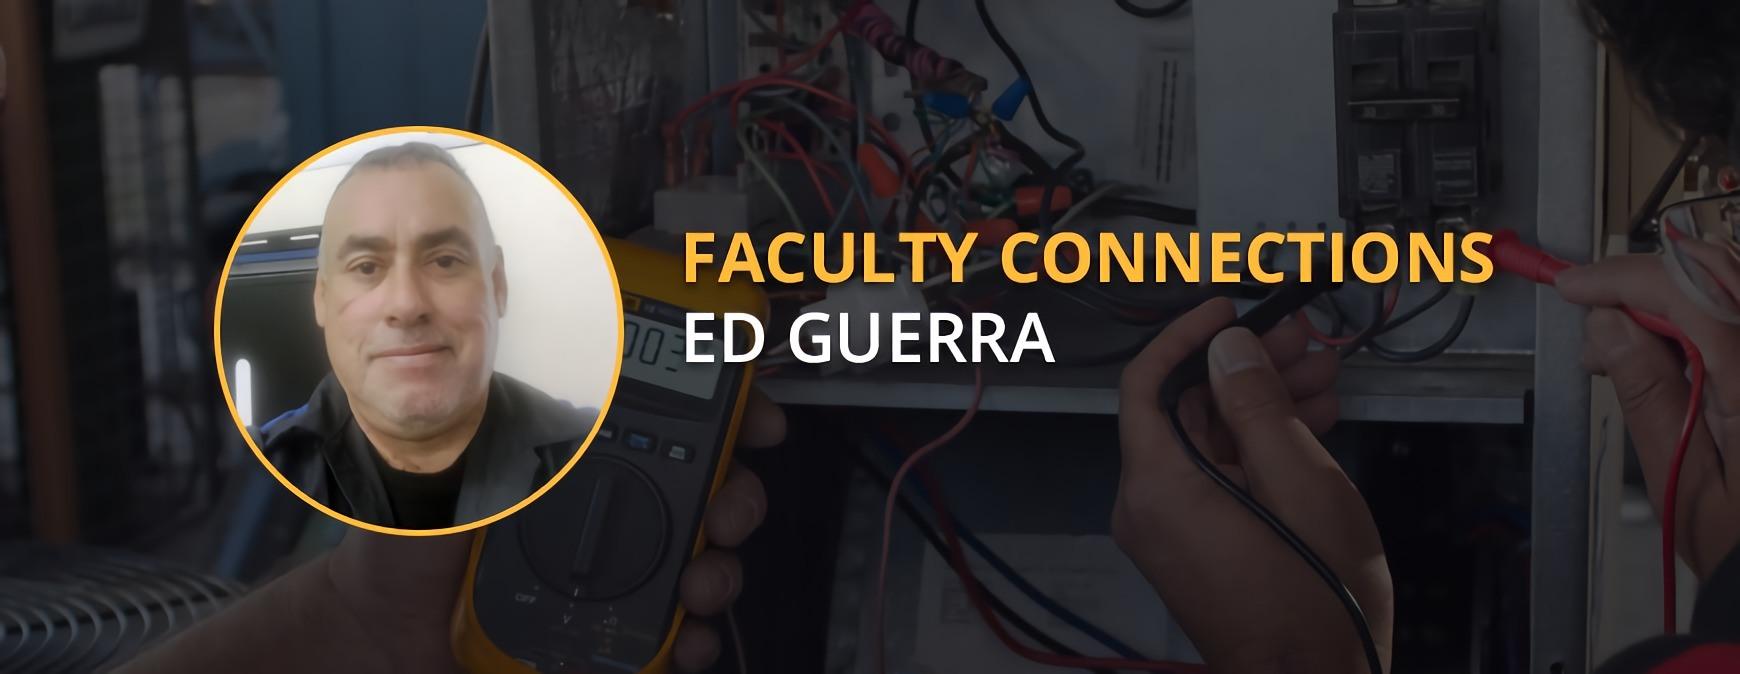 Ed Guerra cover photo